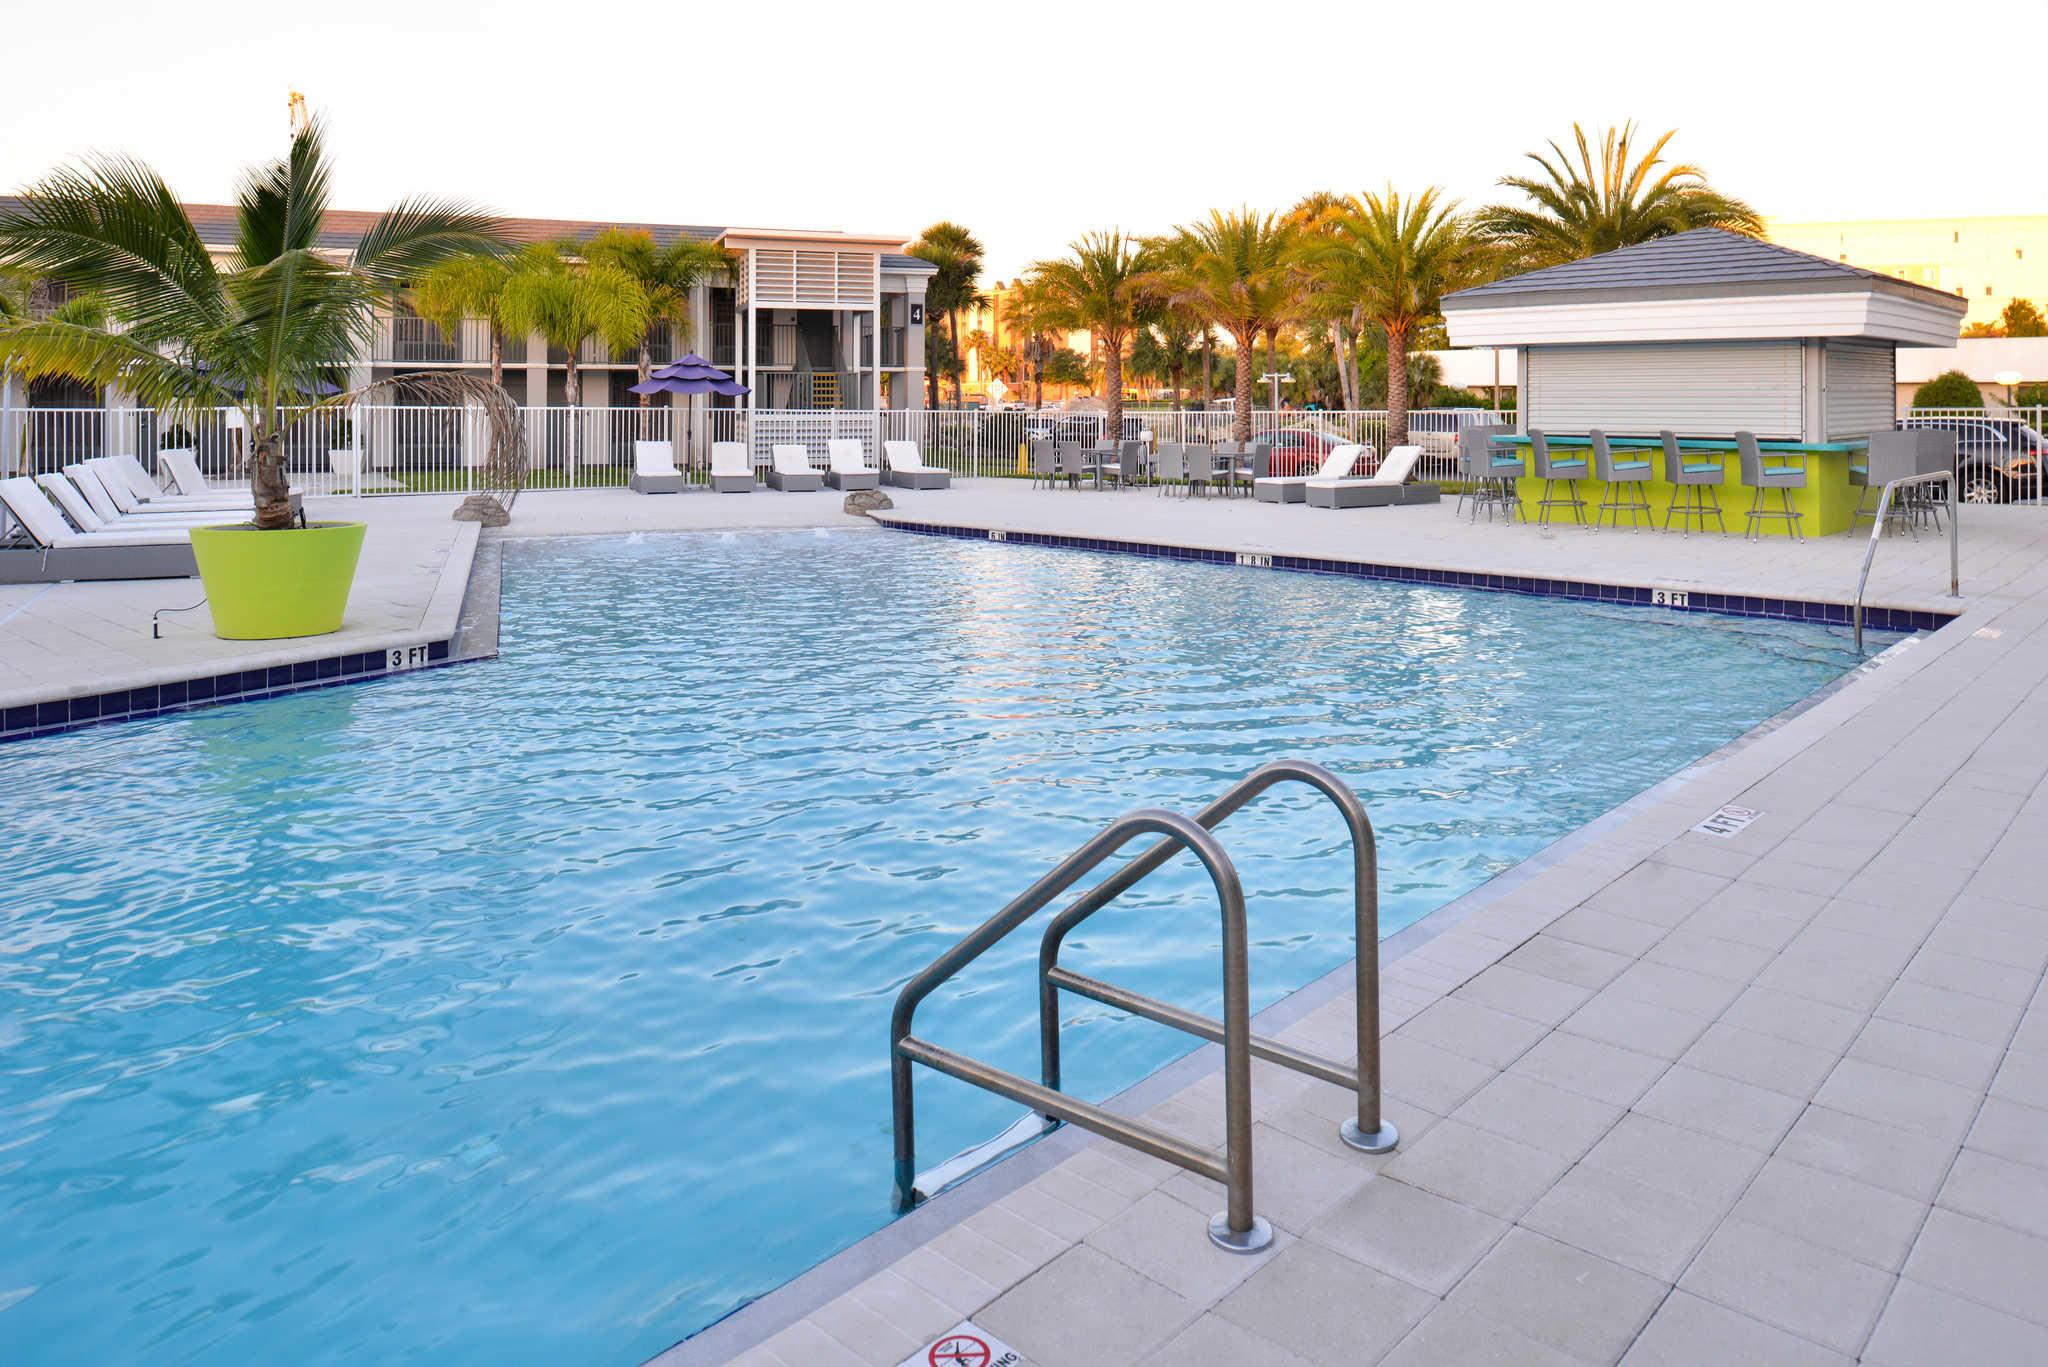 Clarion Inn & Suites Orlando near Theme Parks image 23